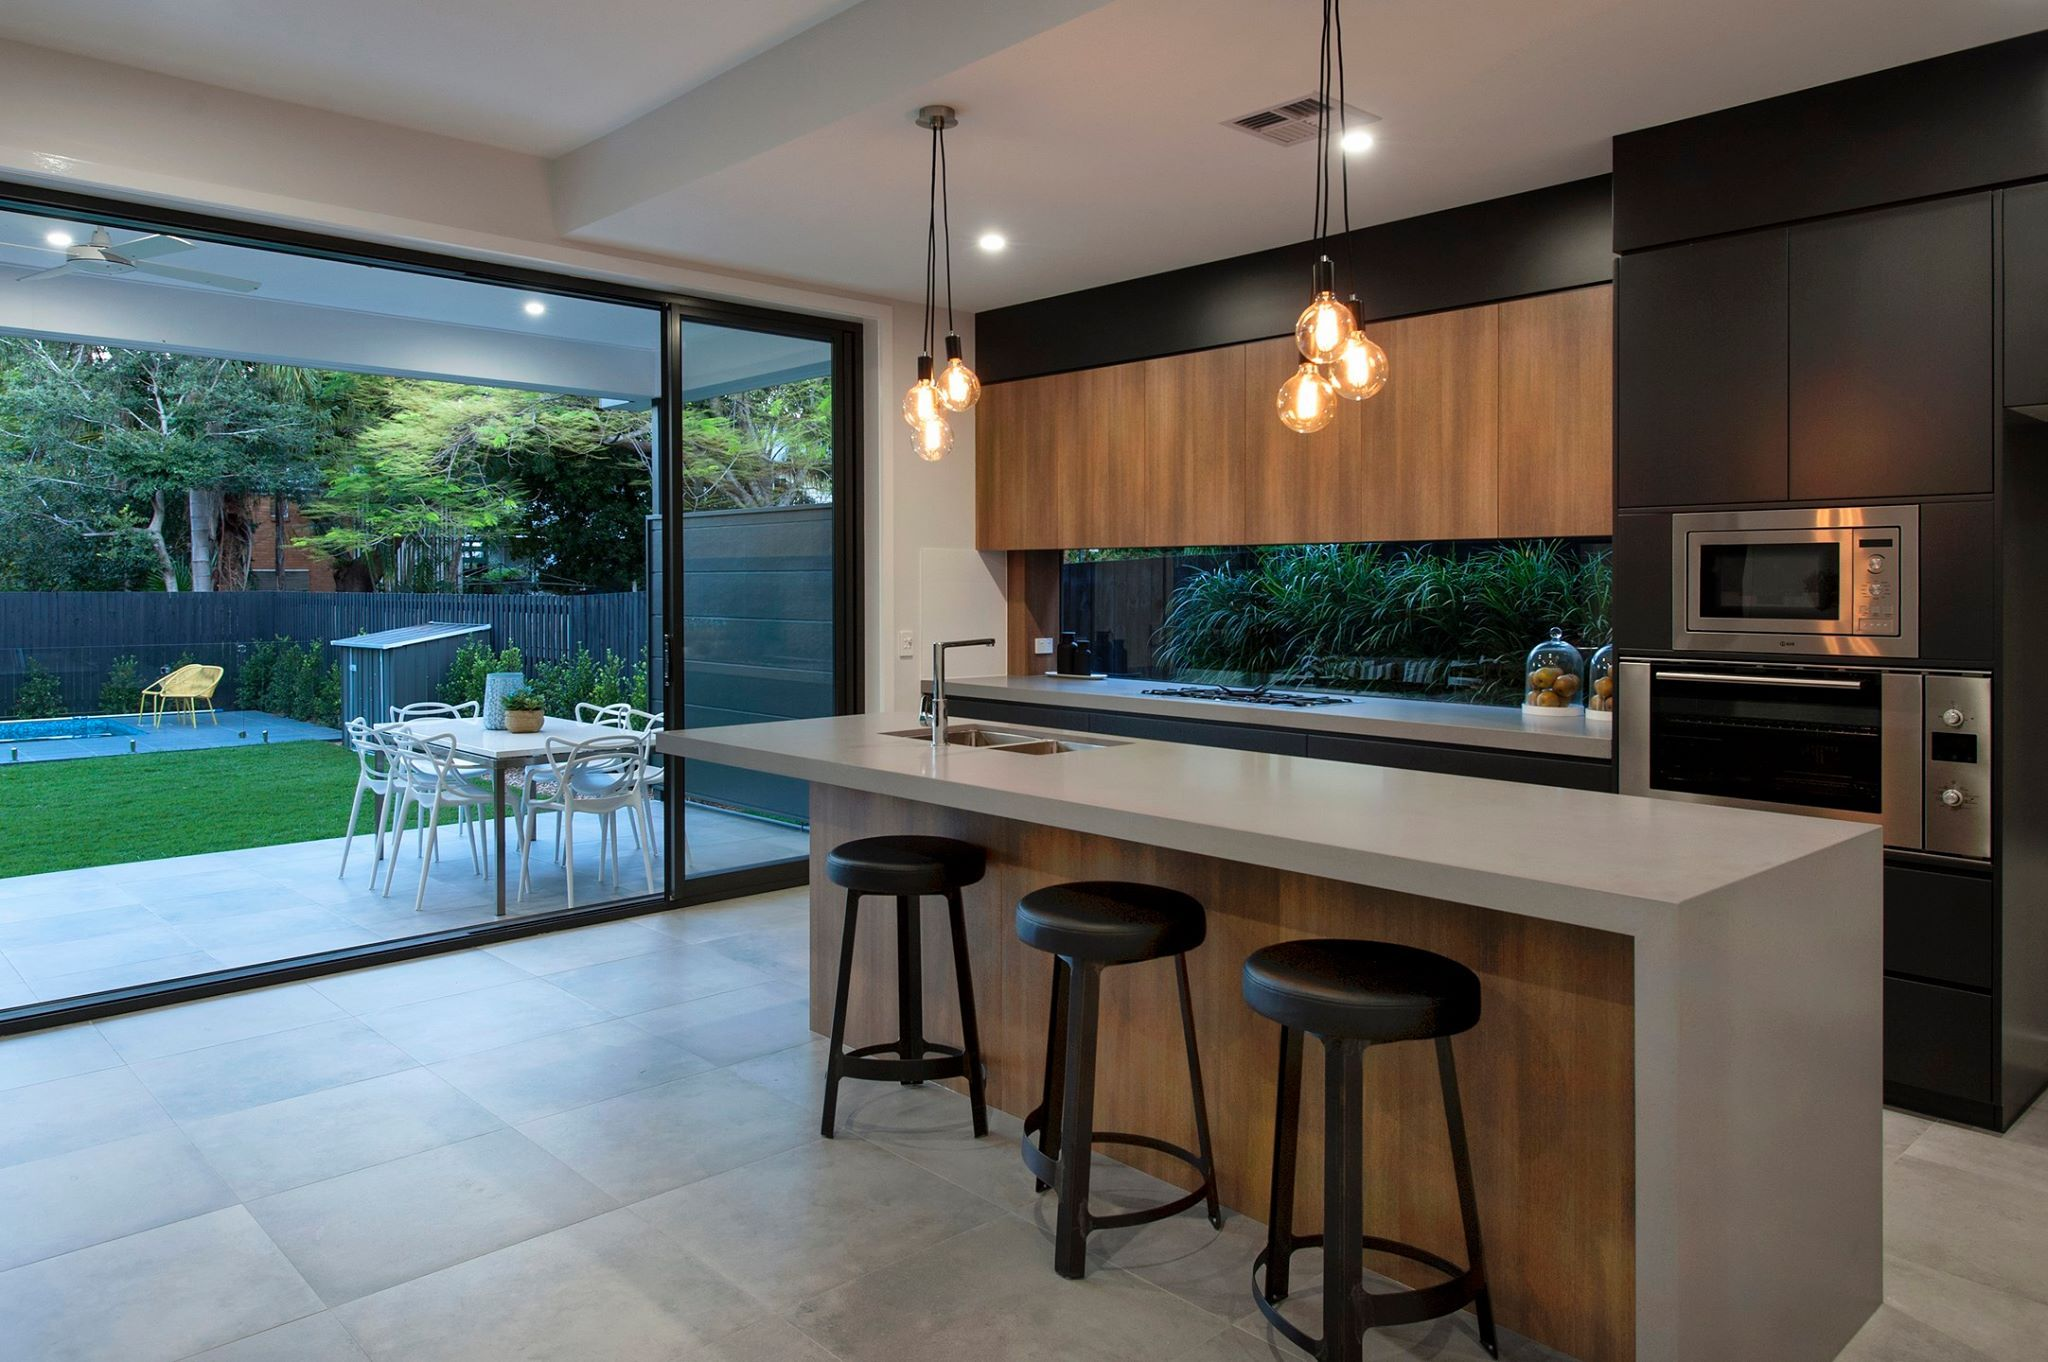 21 4003 Sleek Concrete K2 Projects Big House Little House